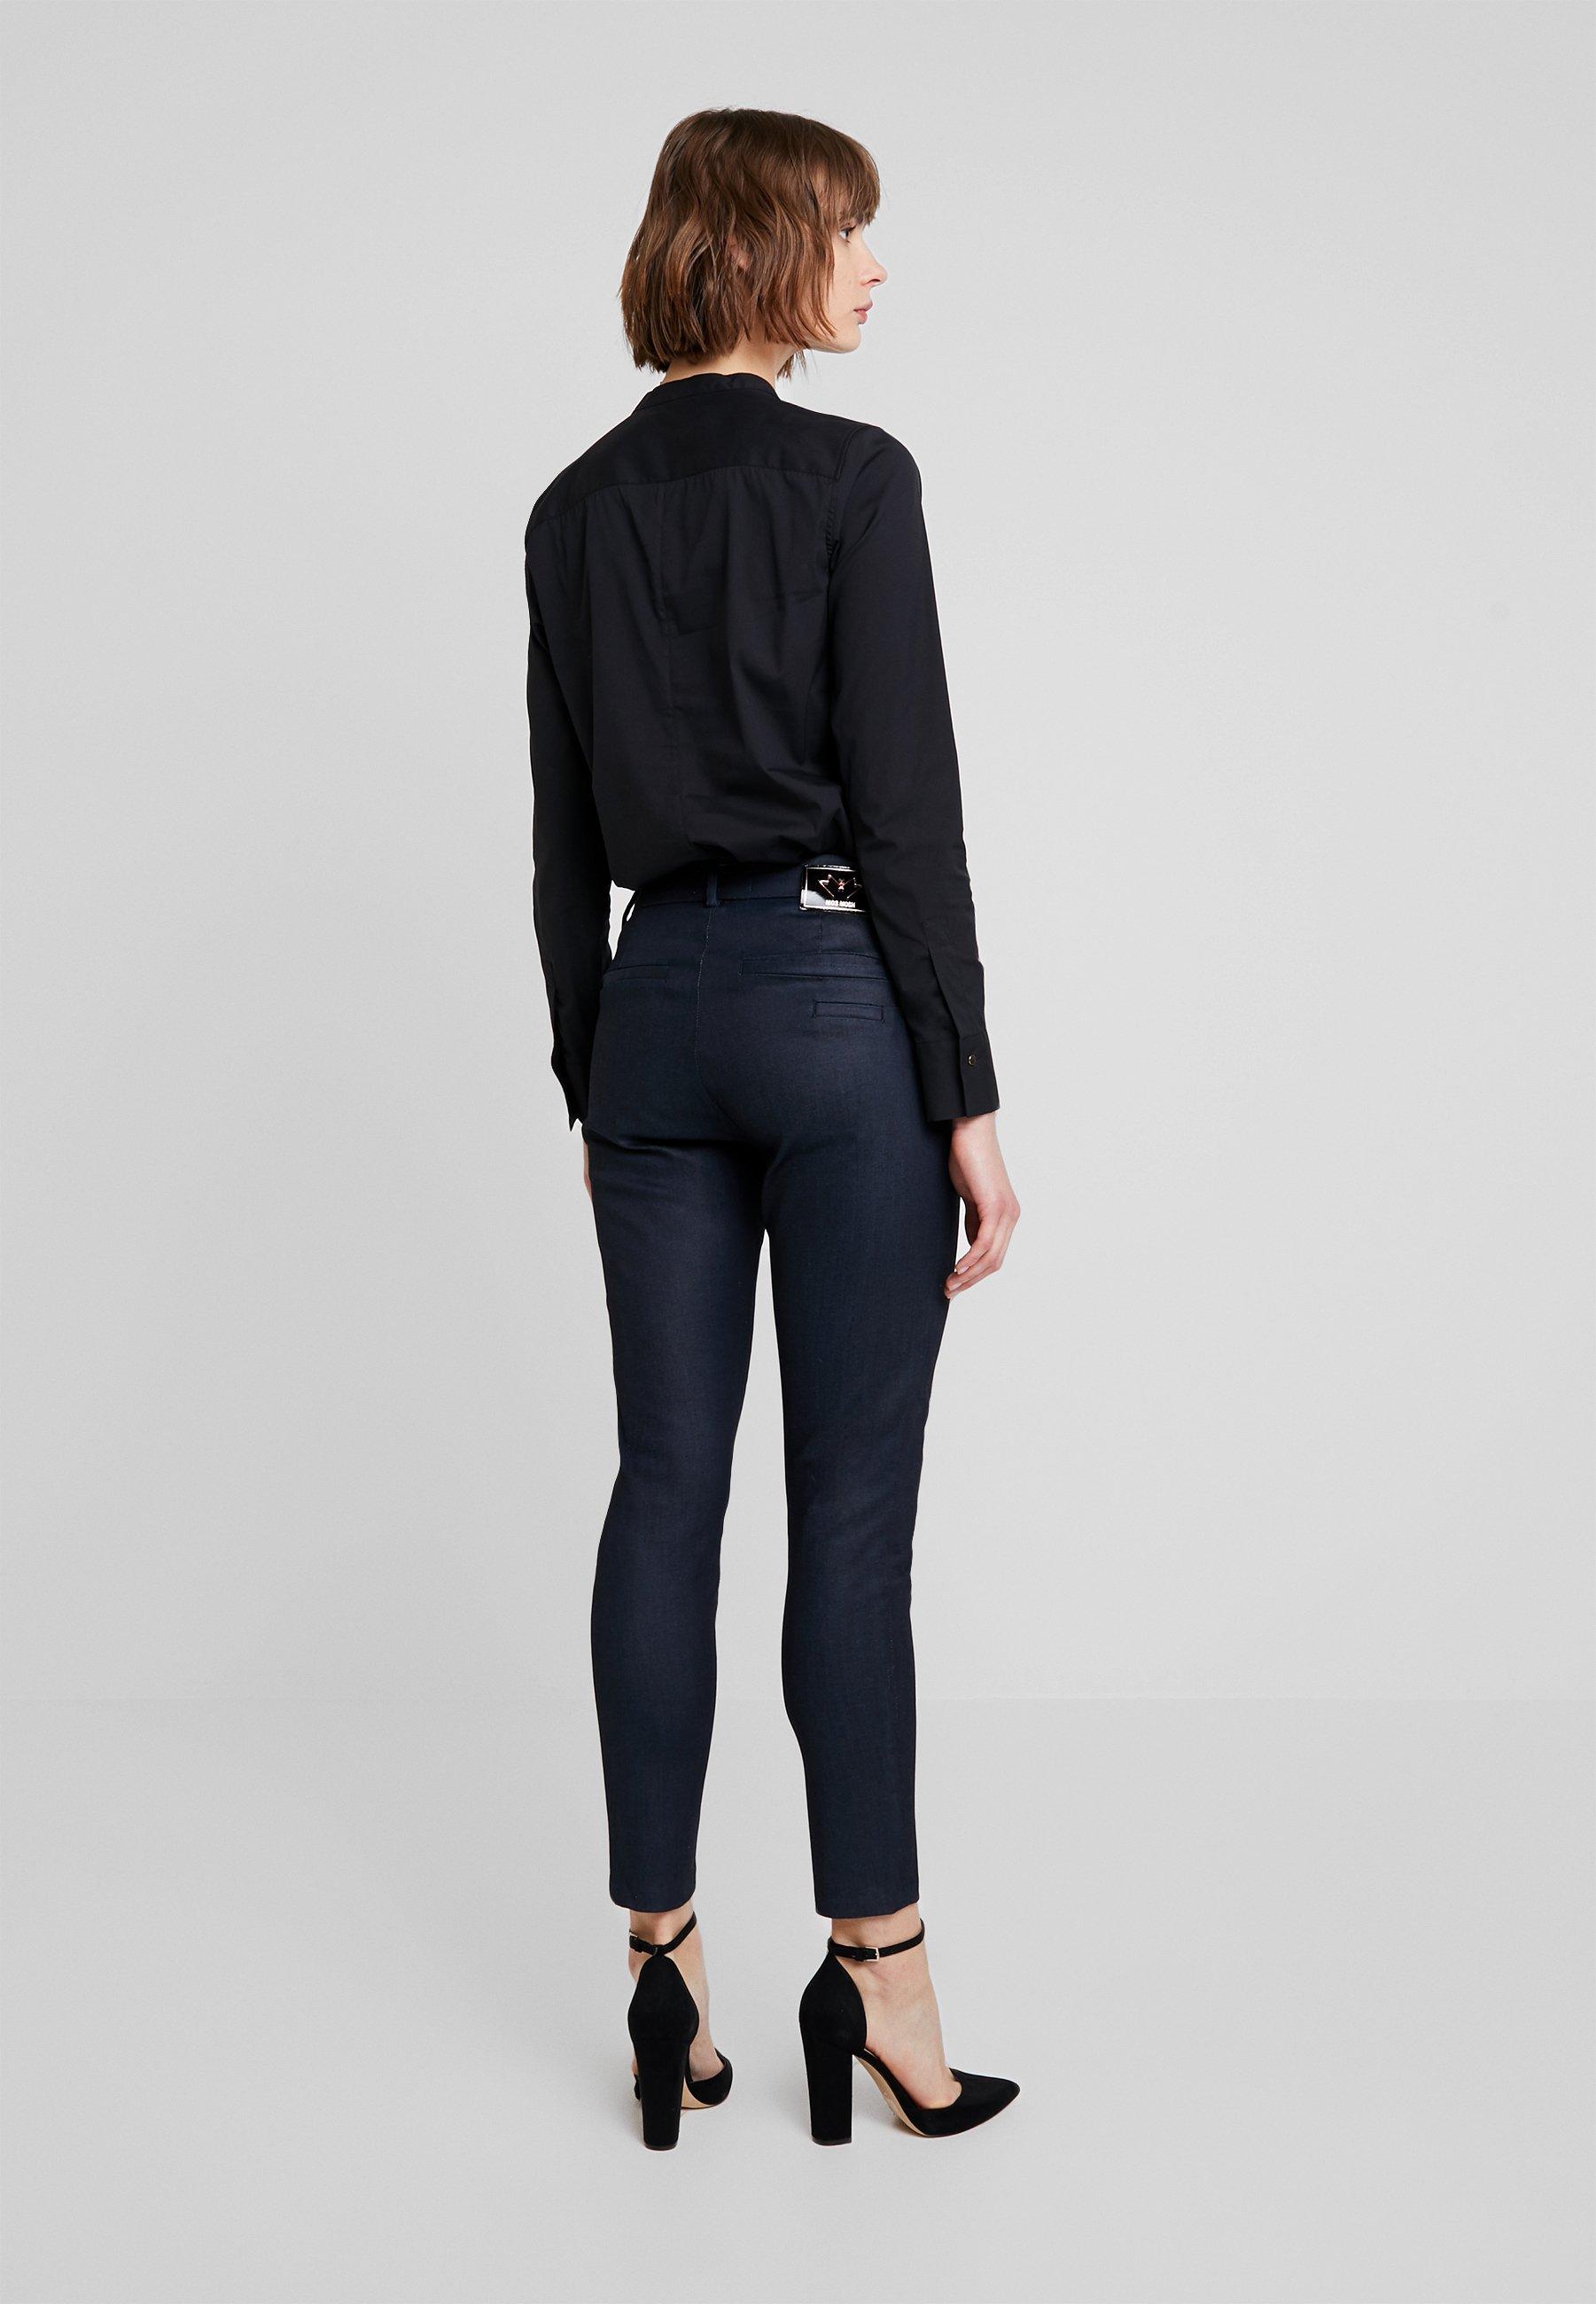 Mos Skinny Dark PantJeans Gallery Blue Mosh Blake eWdQrBoCx